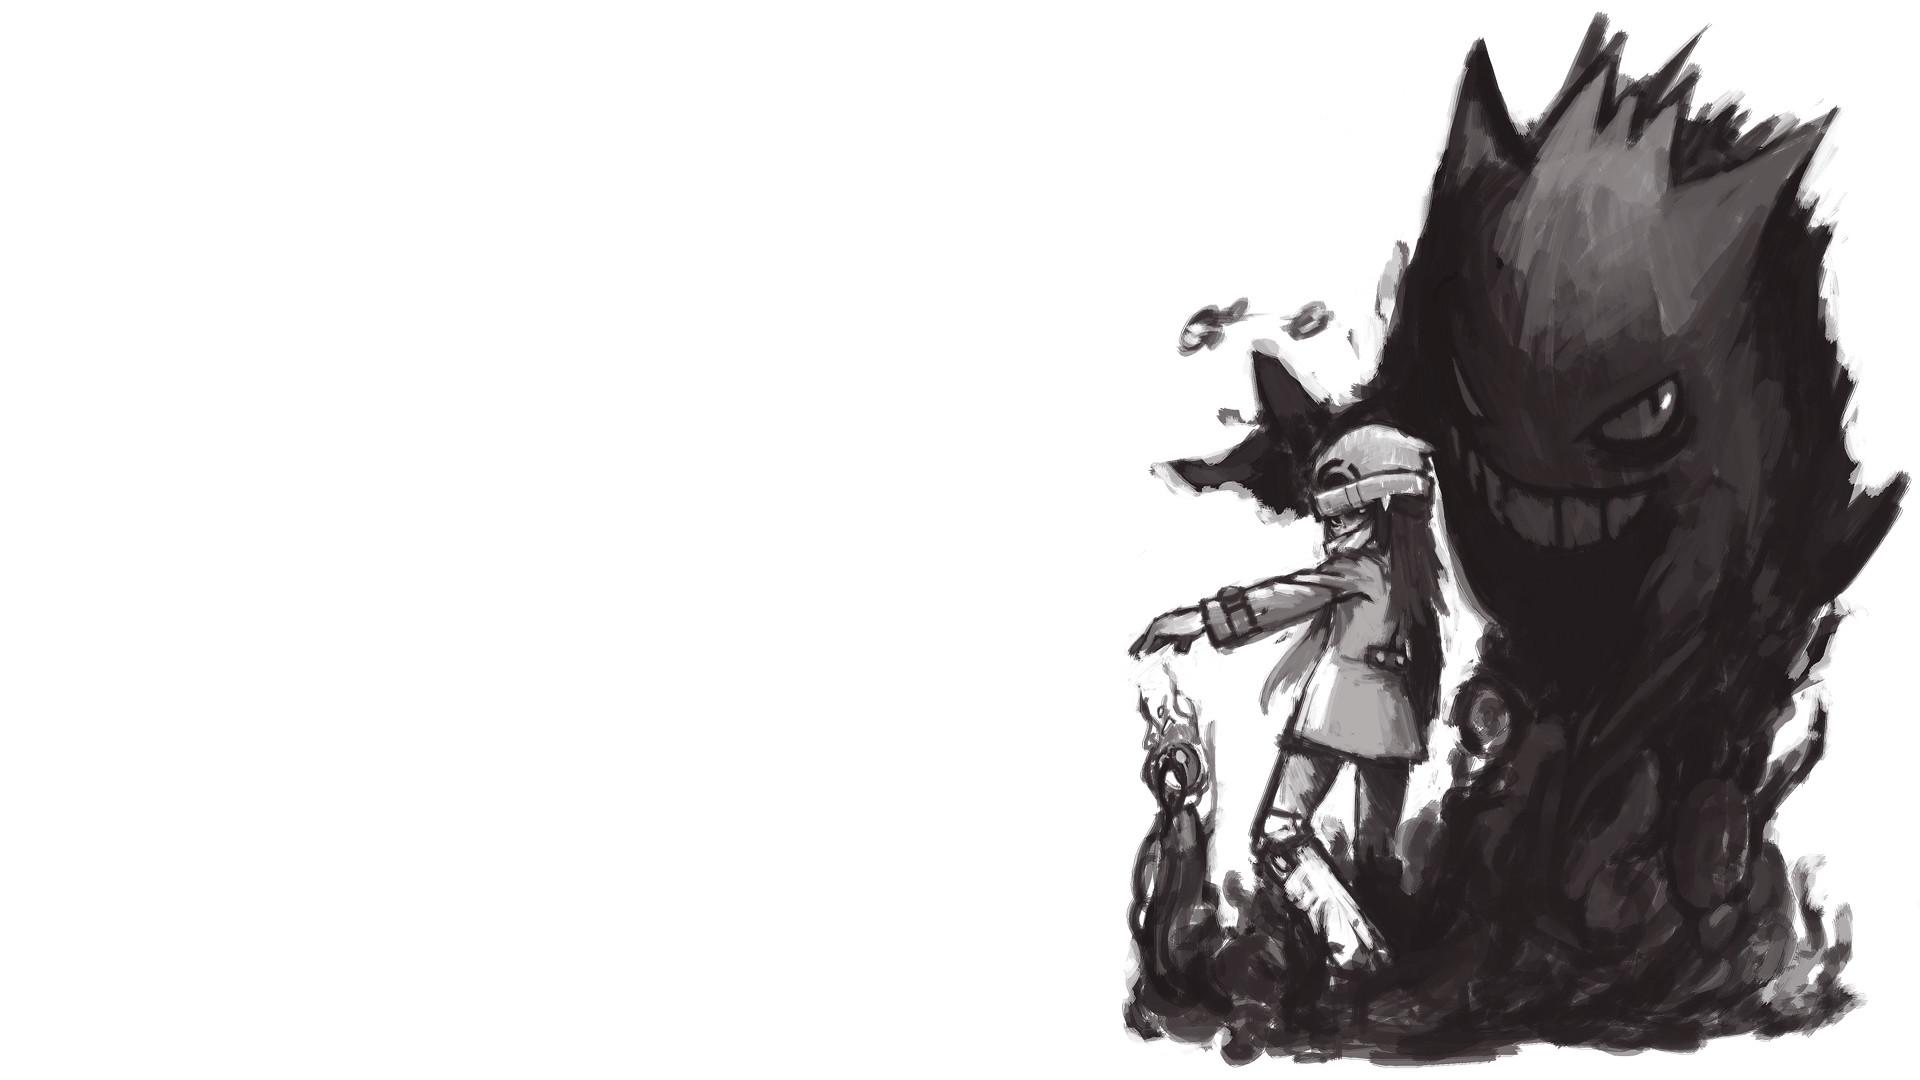 Video Game РPok̩mon Gengar (Pok̩mon) Wallpaper